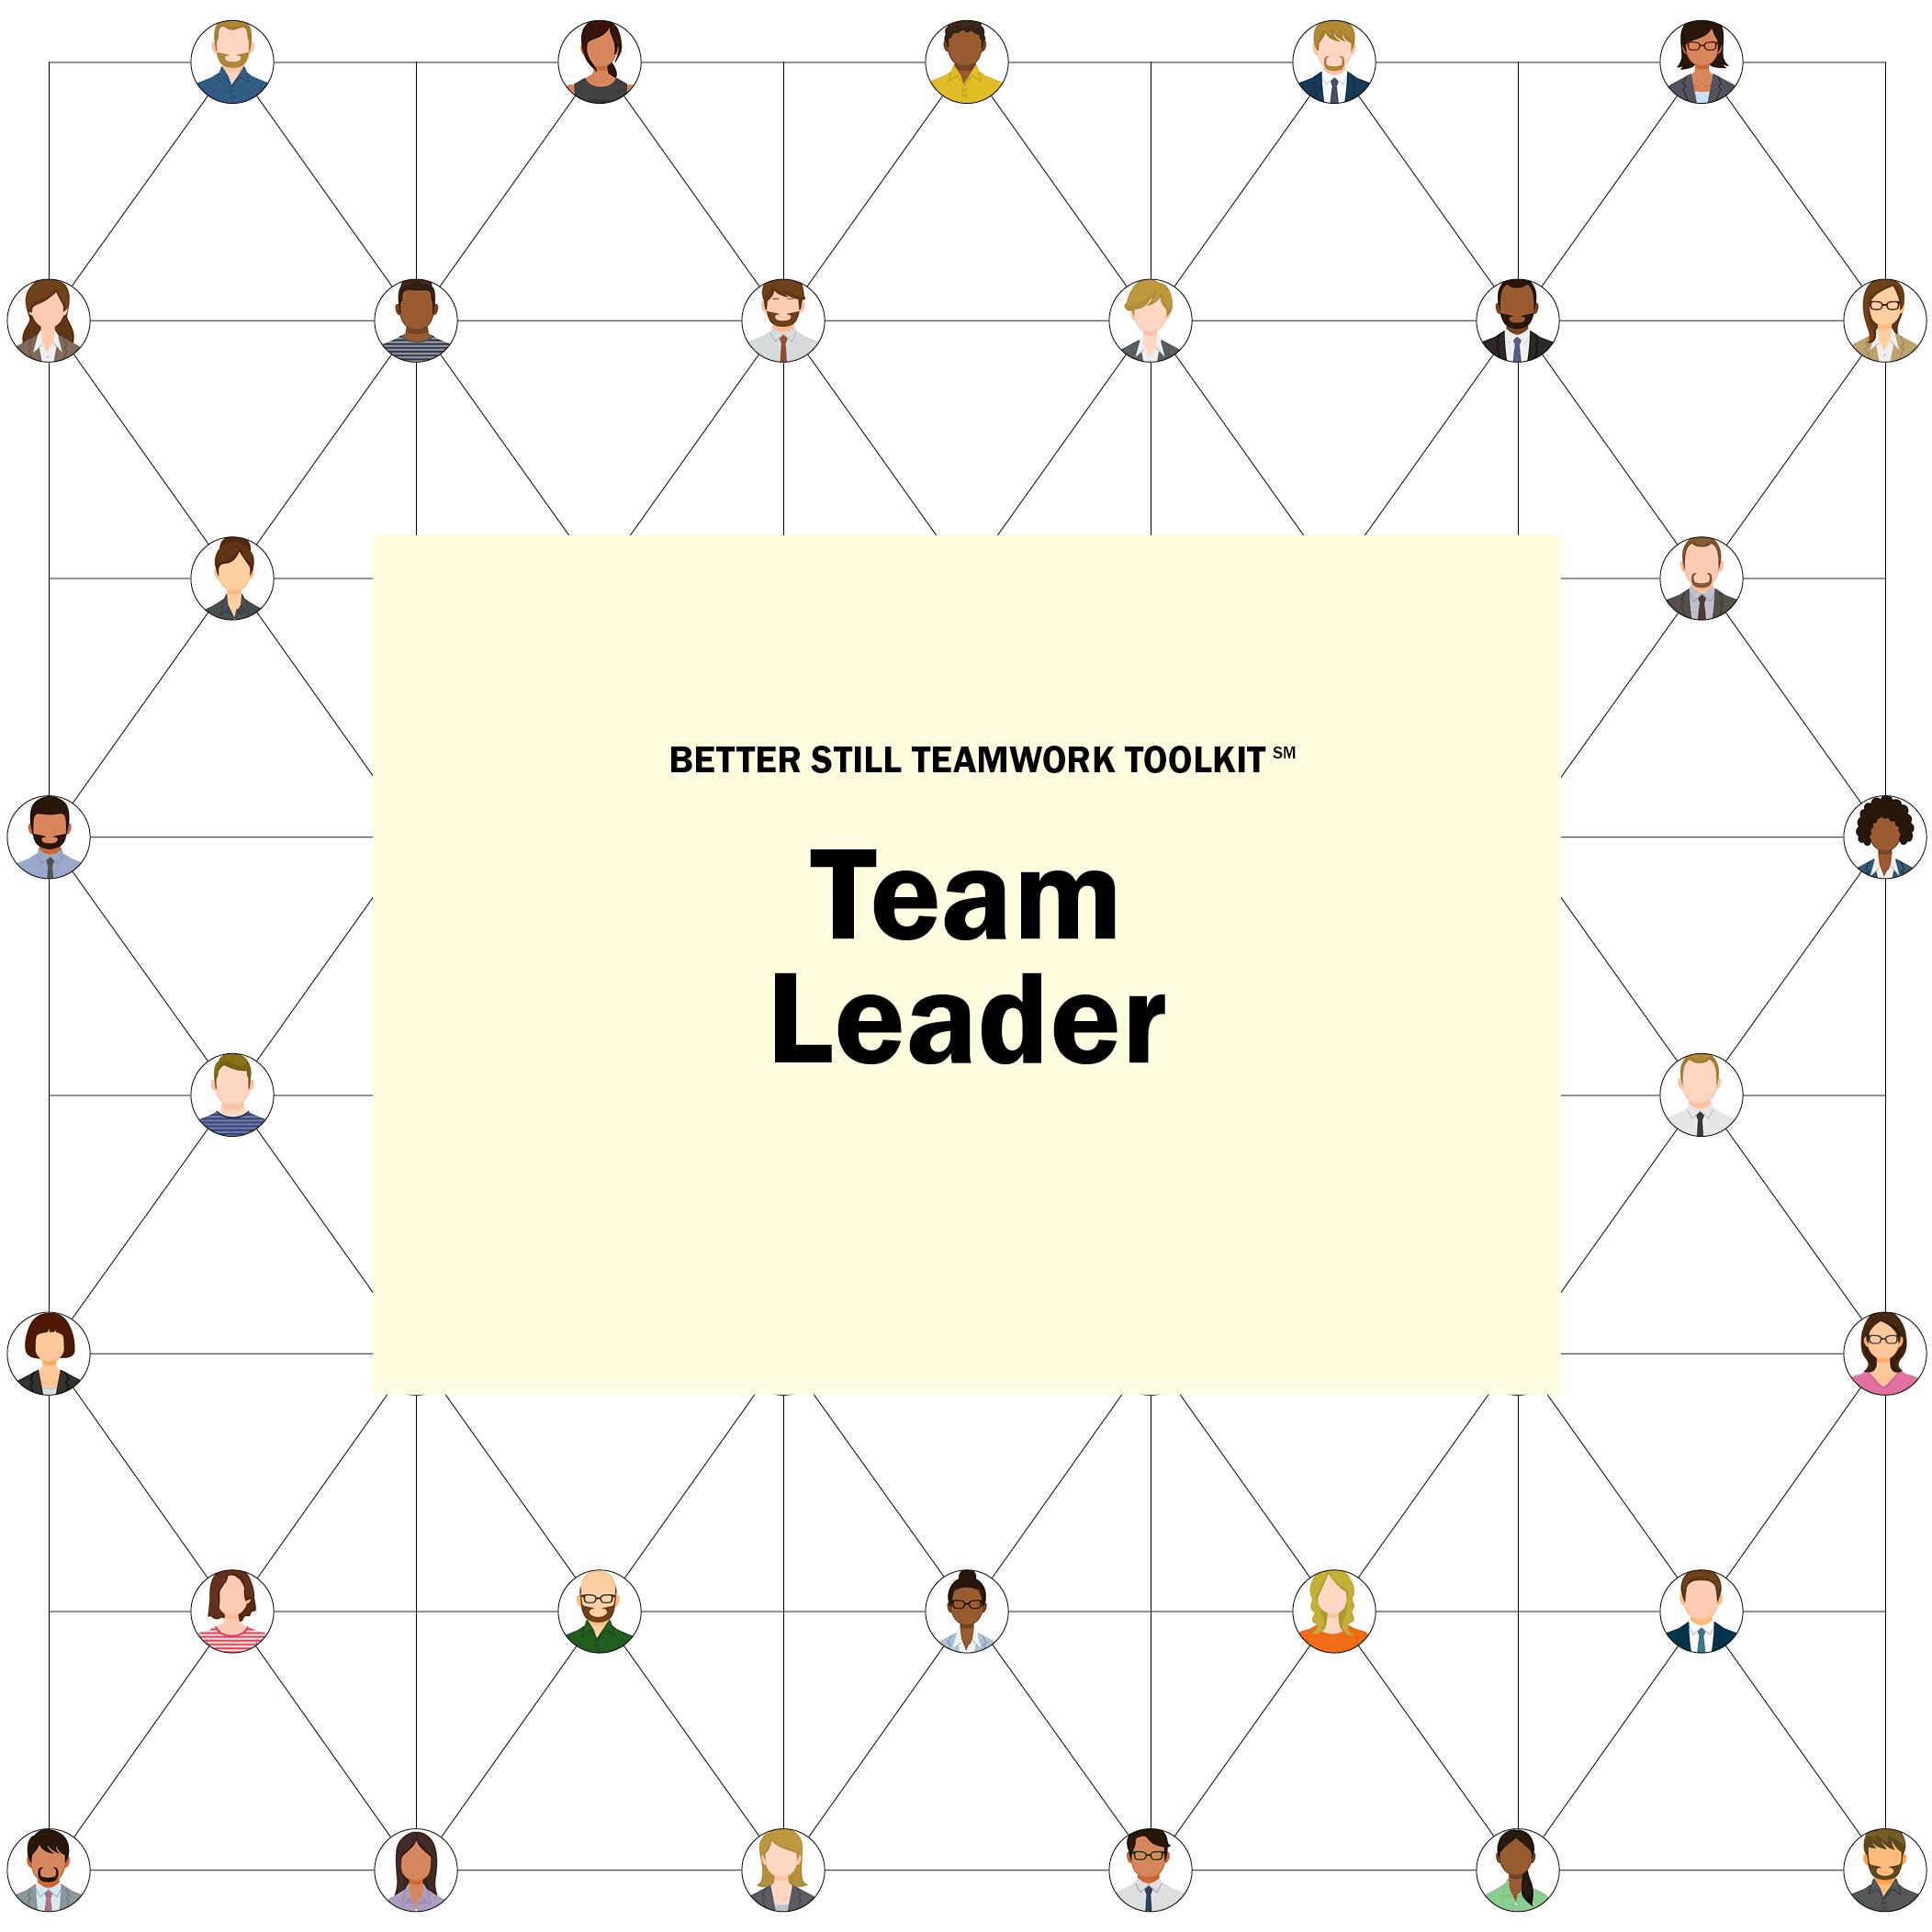 Better Still Teamwork Toolkit—Team Leader